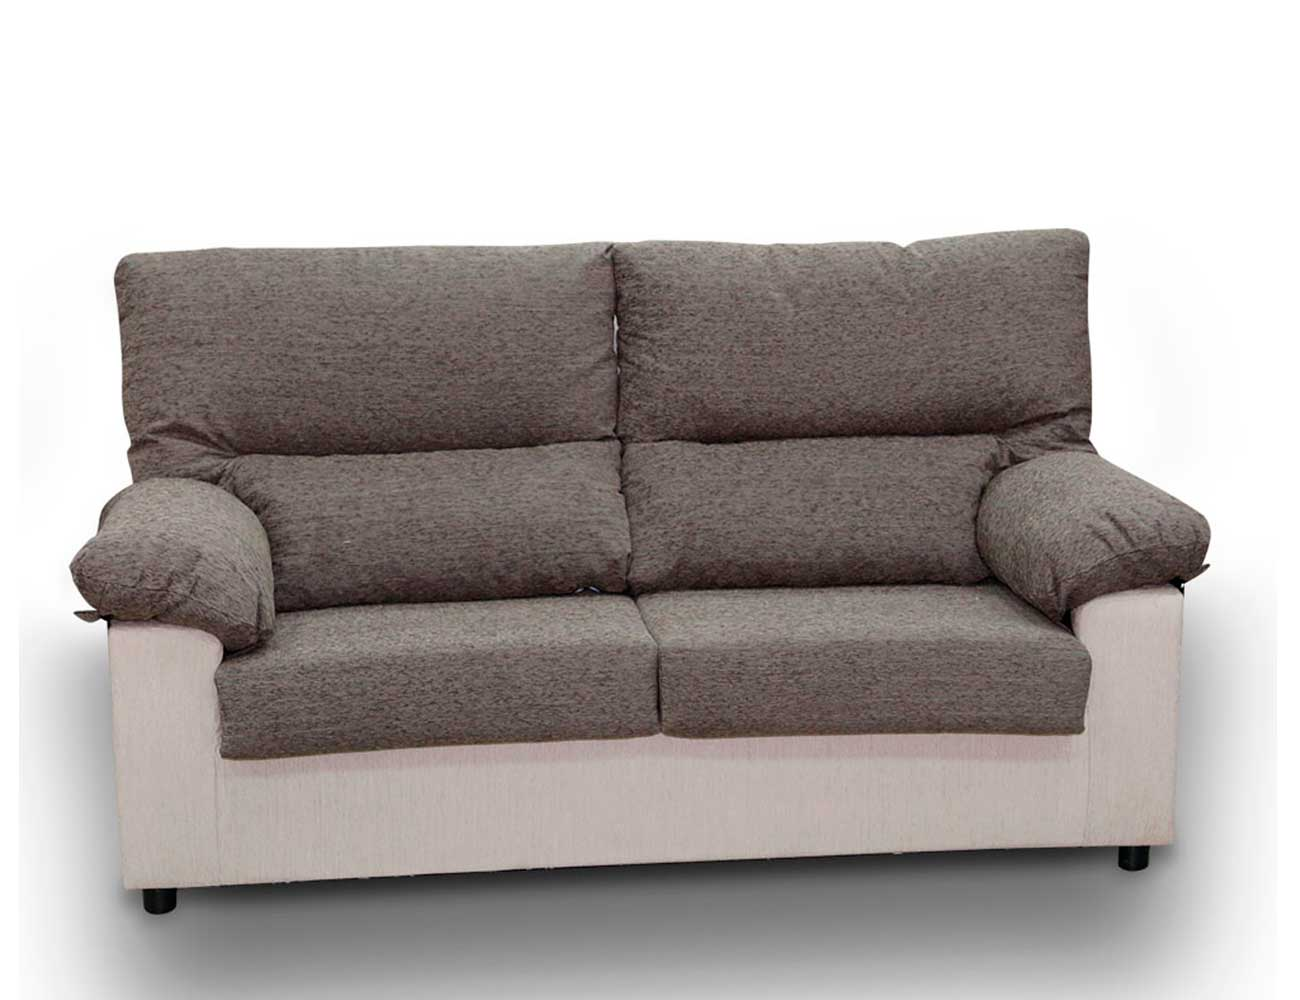 Sofa 3 plazas barato20